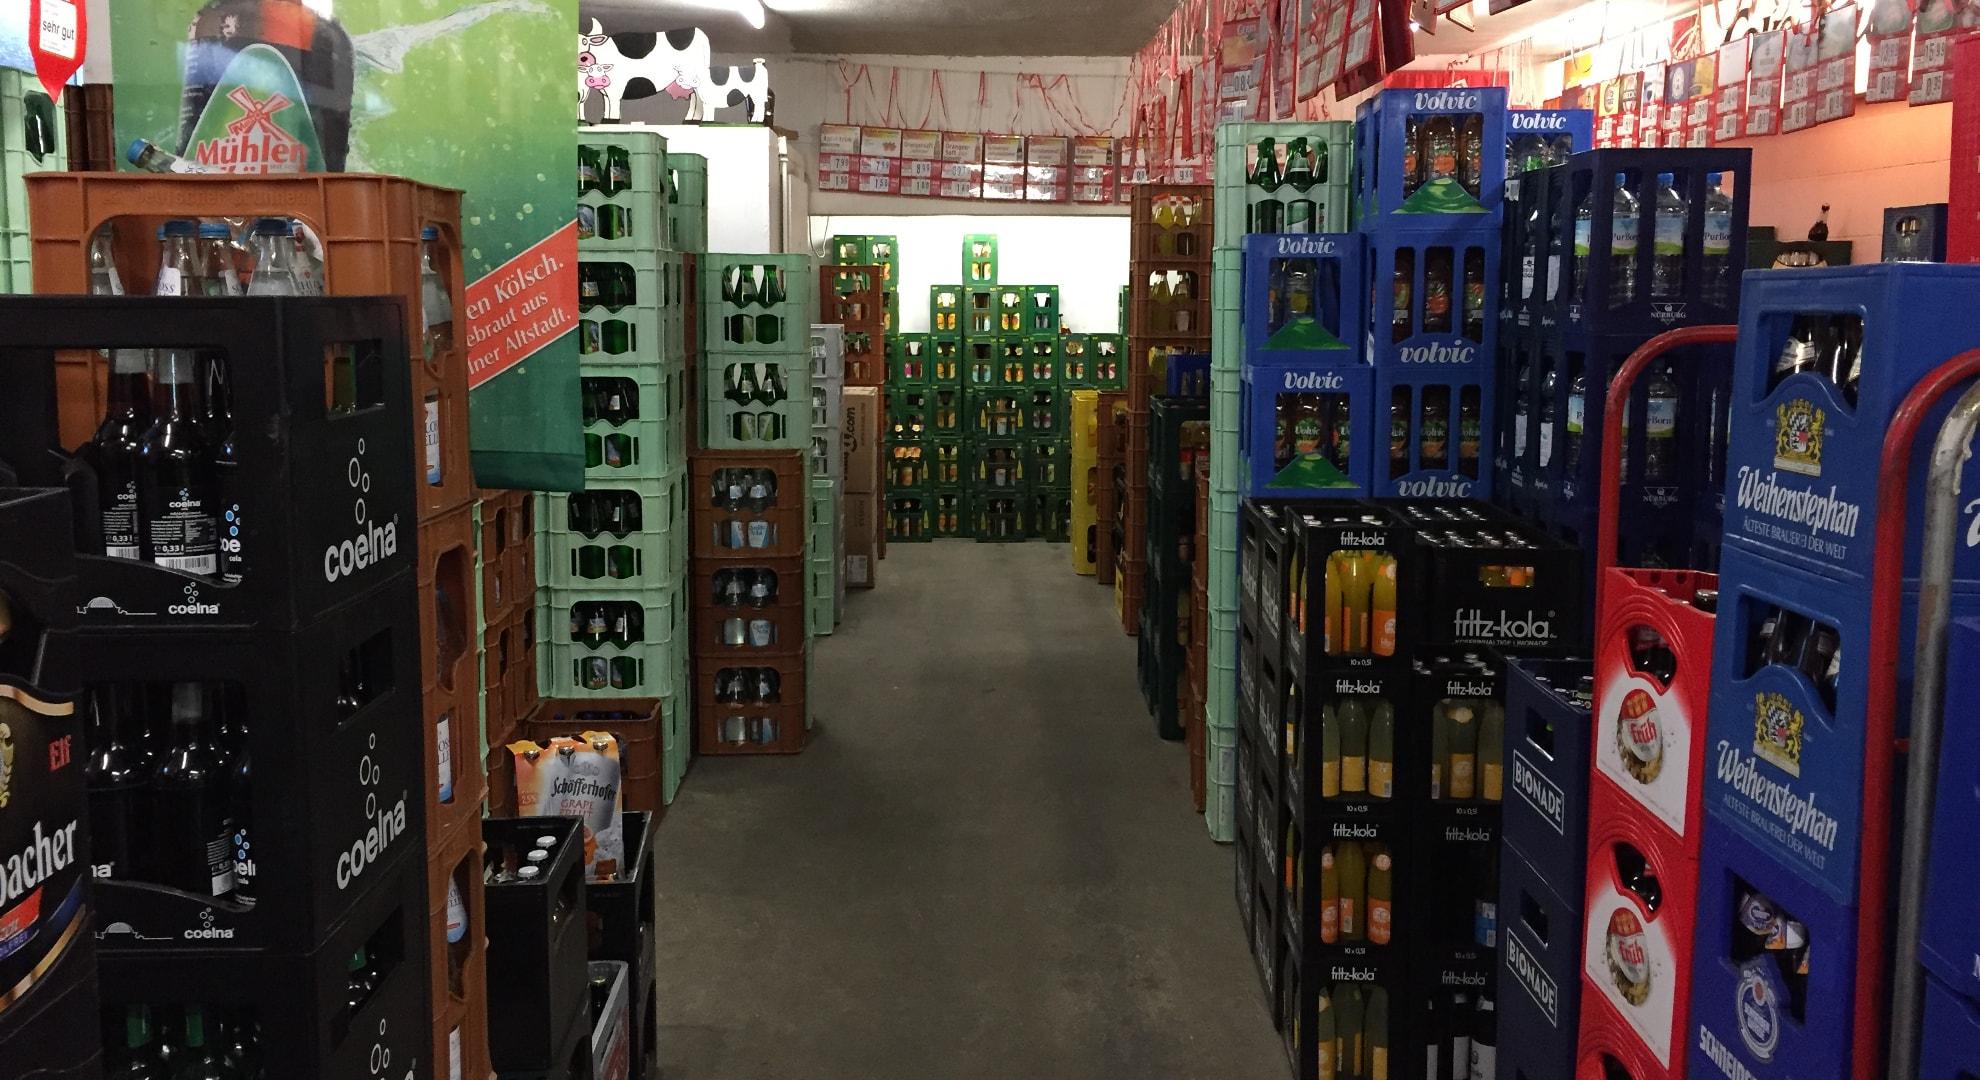 Getränke bringen lassen in Köln